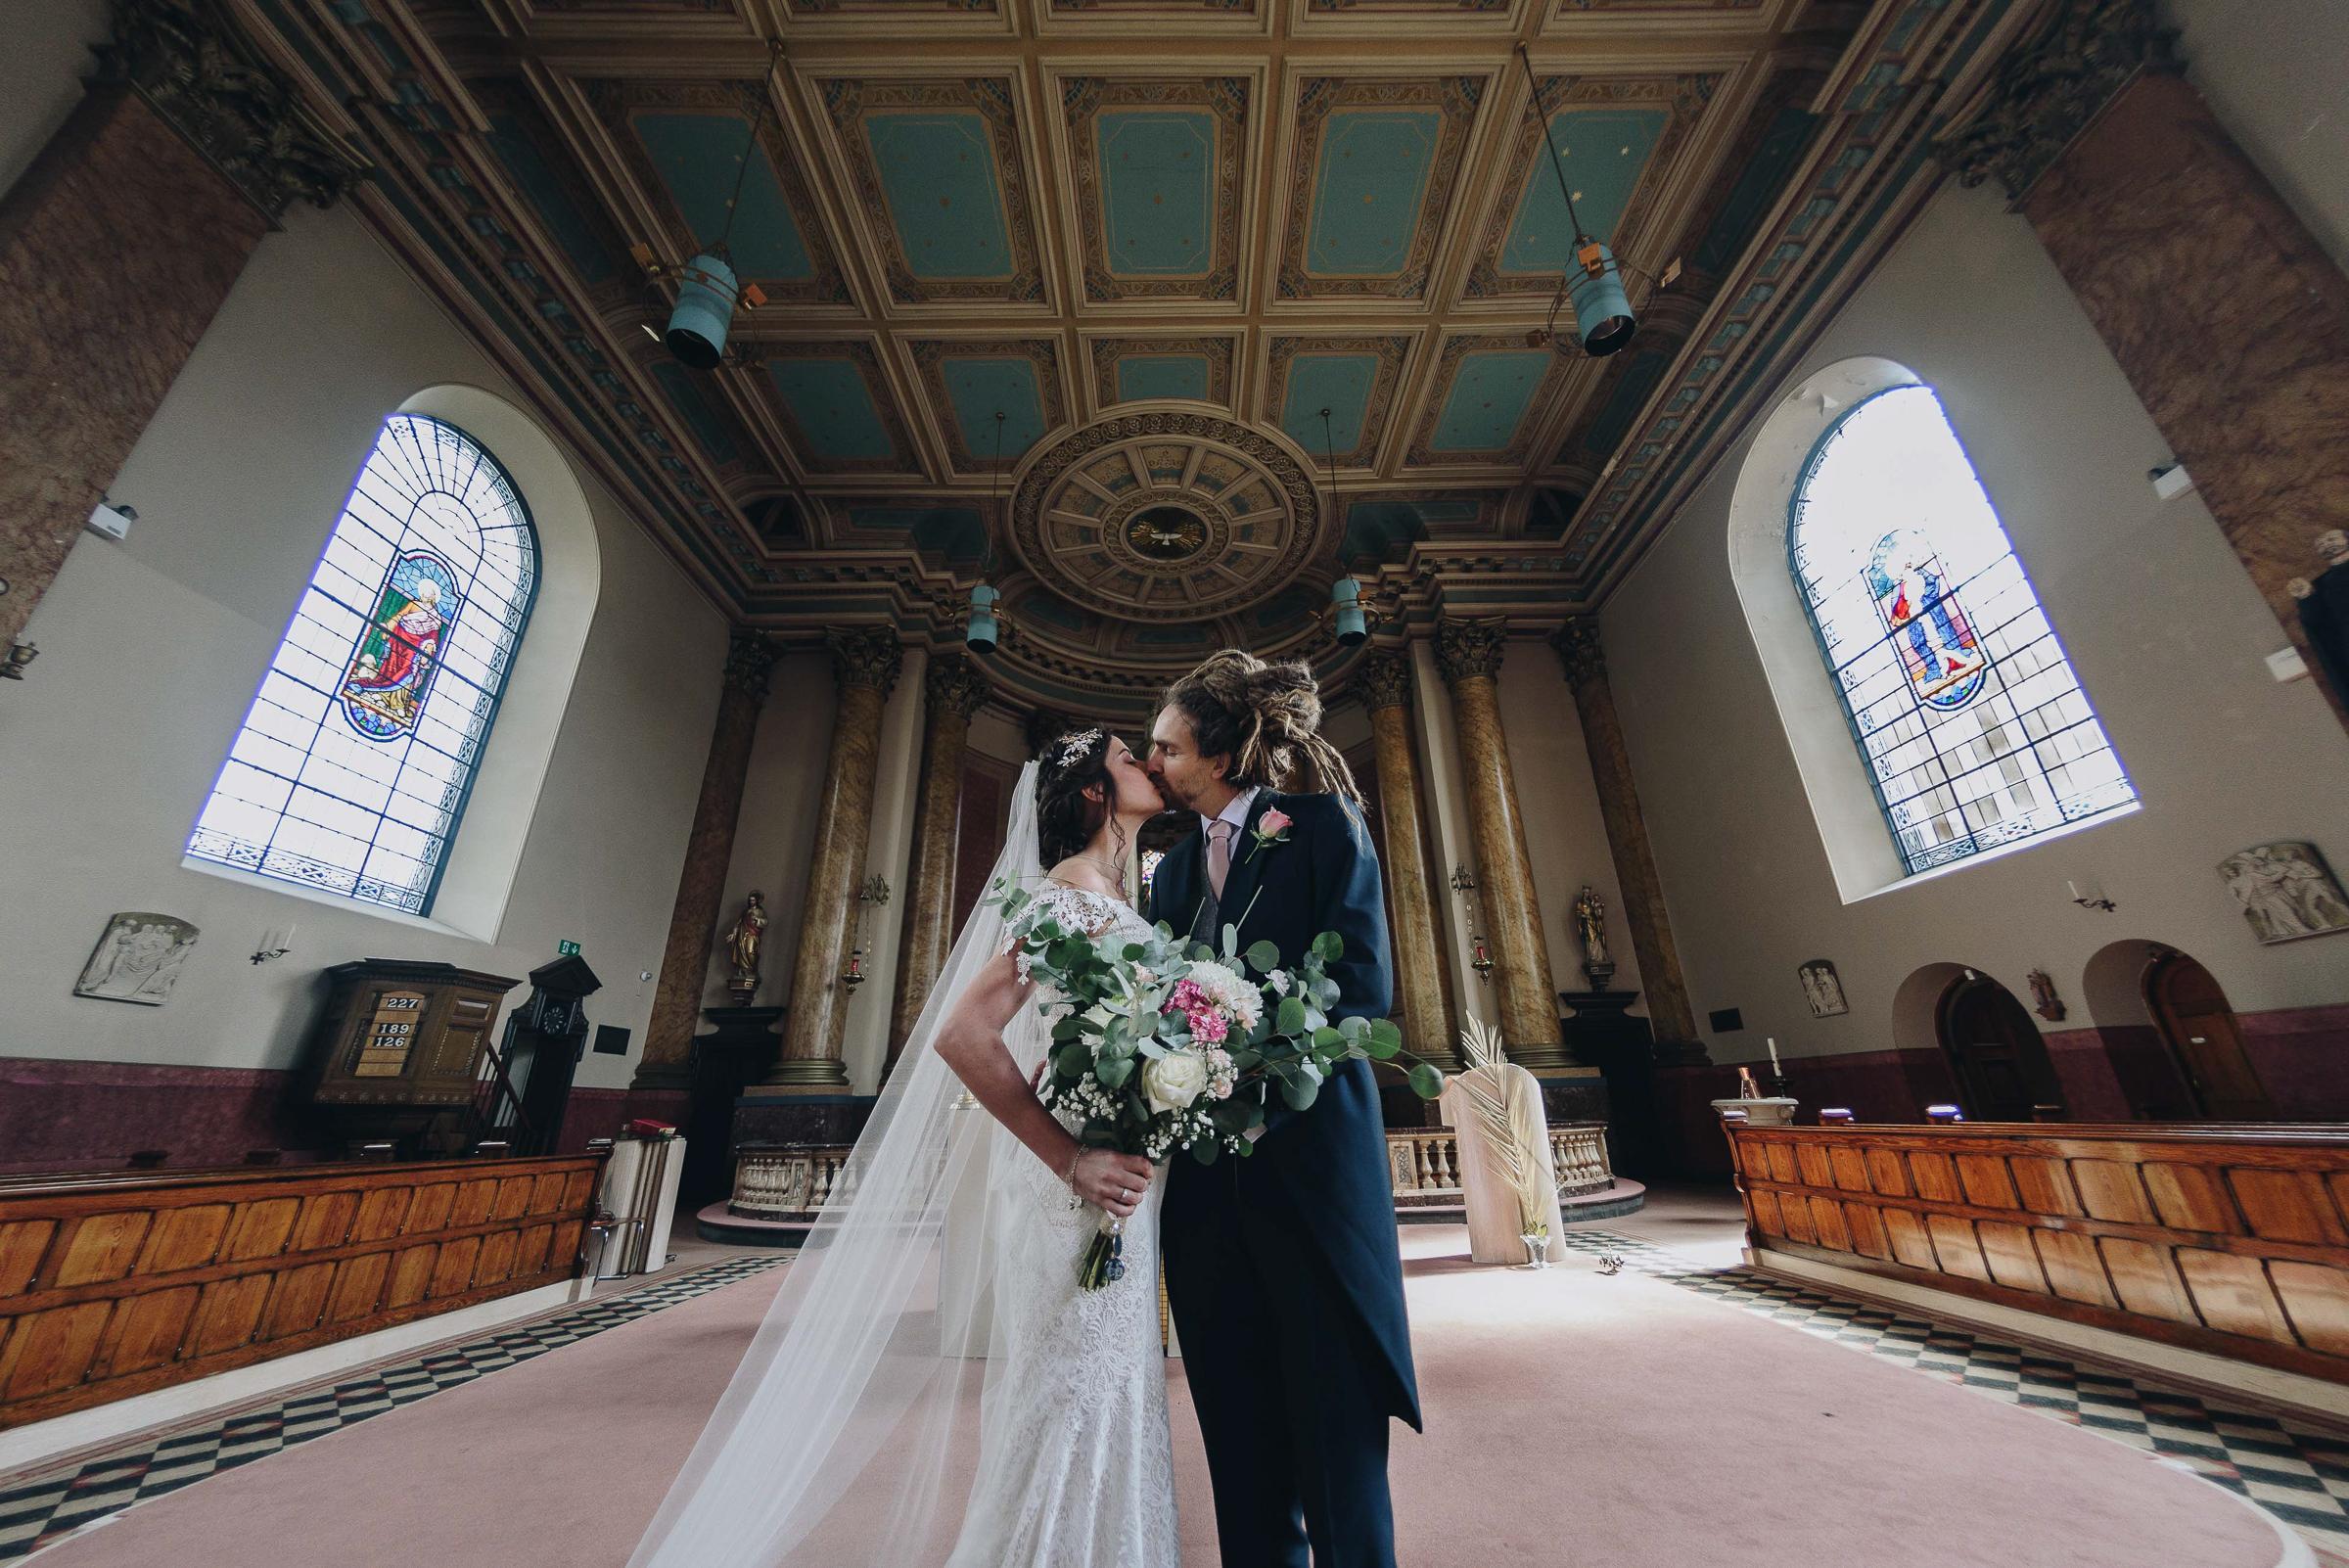 Rochdale-town-hall-vegan-harry-potter-wedding-photography-28.jpg